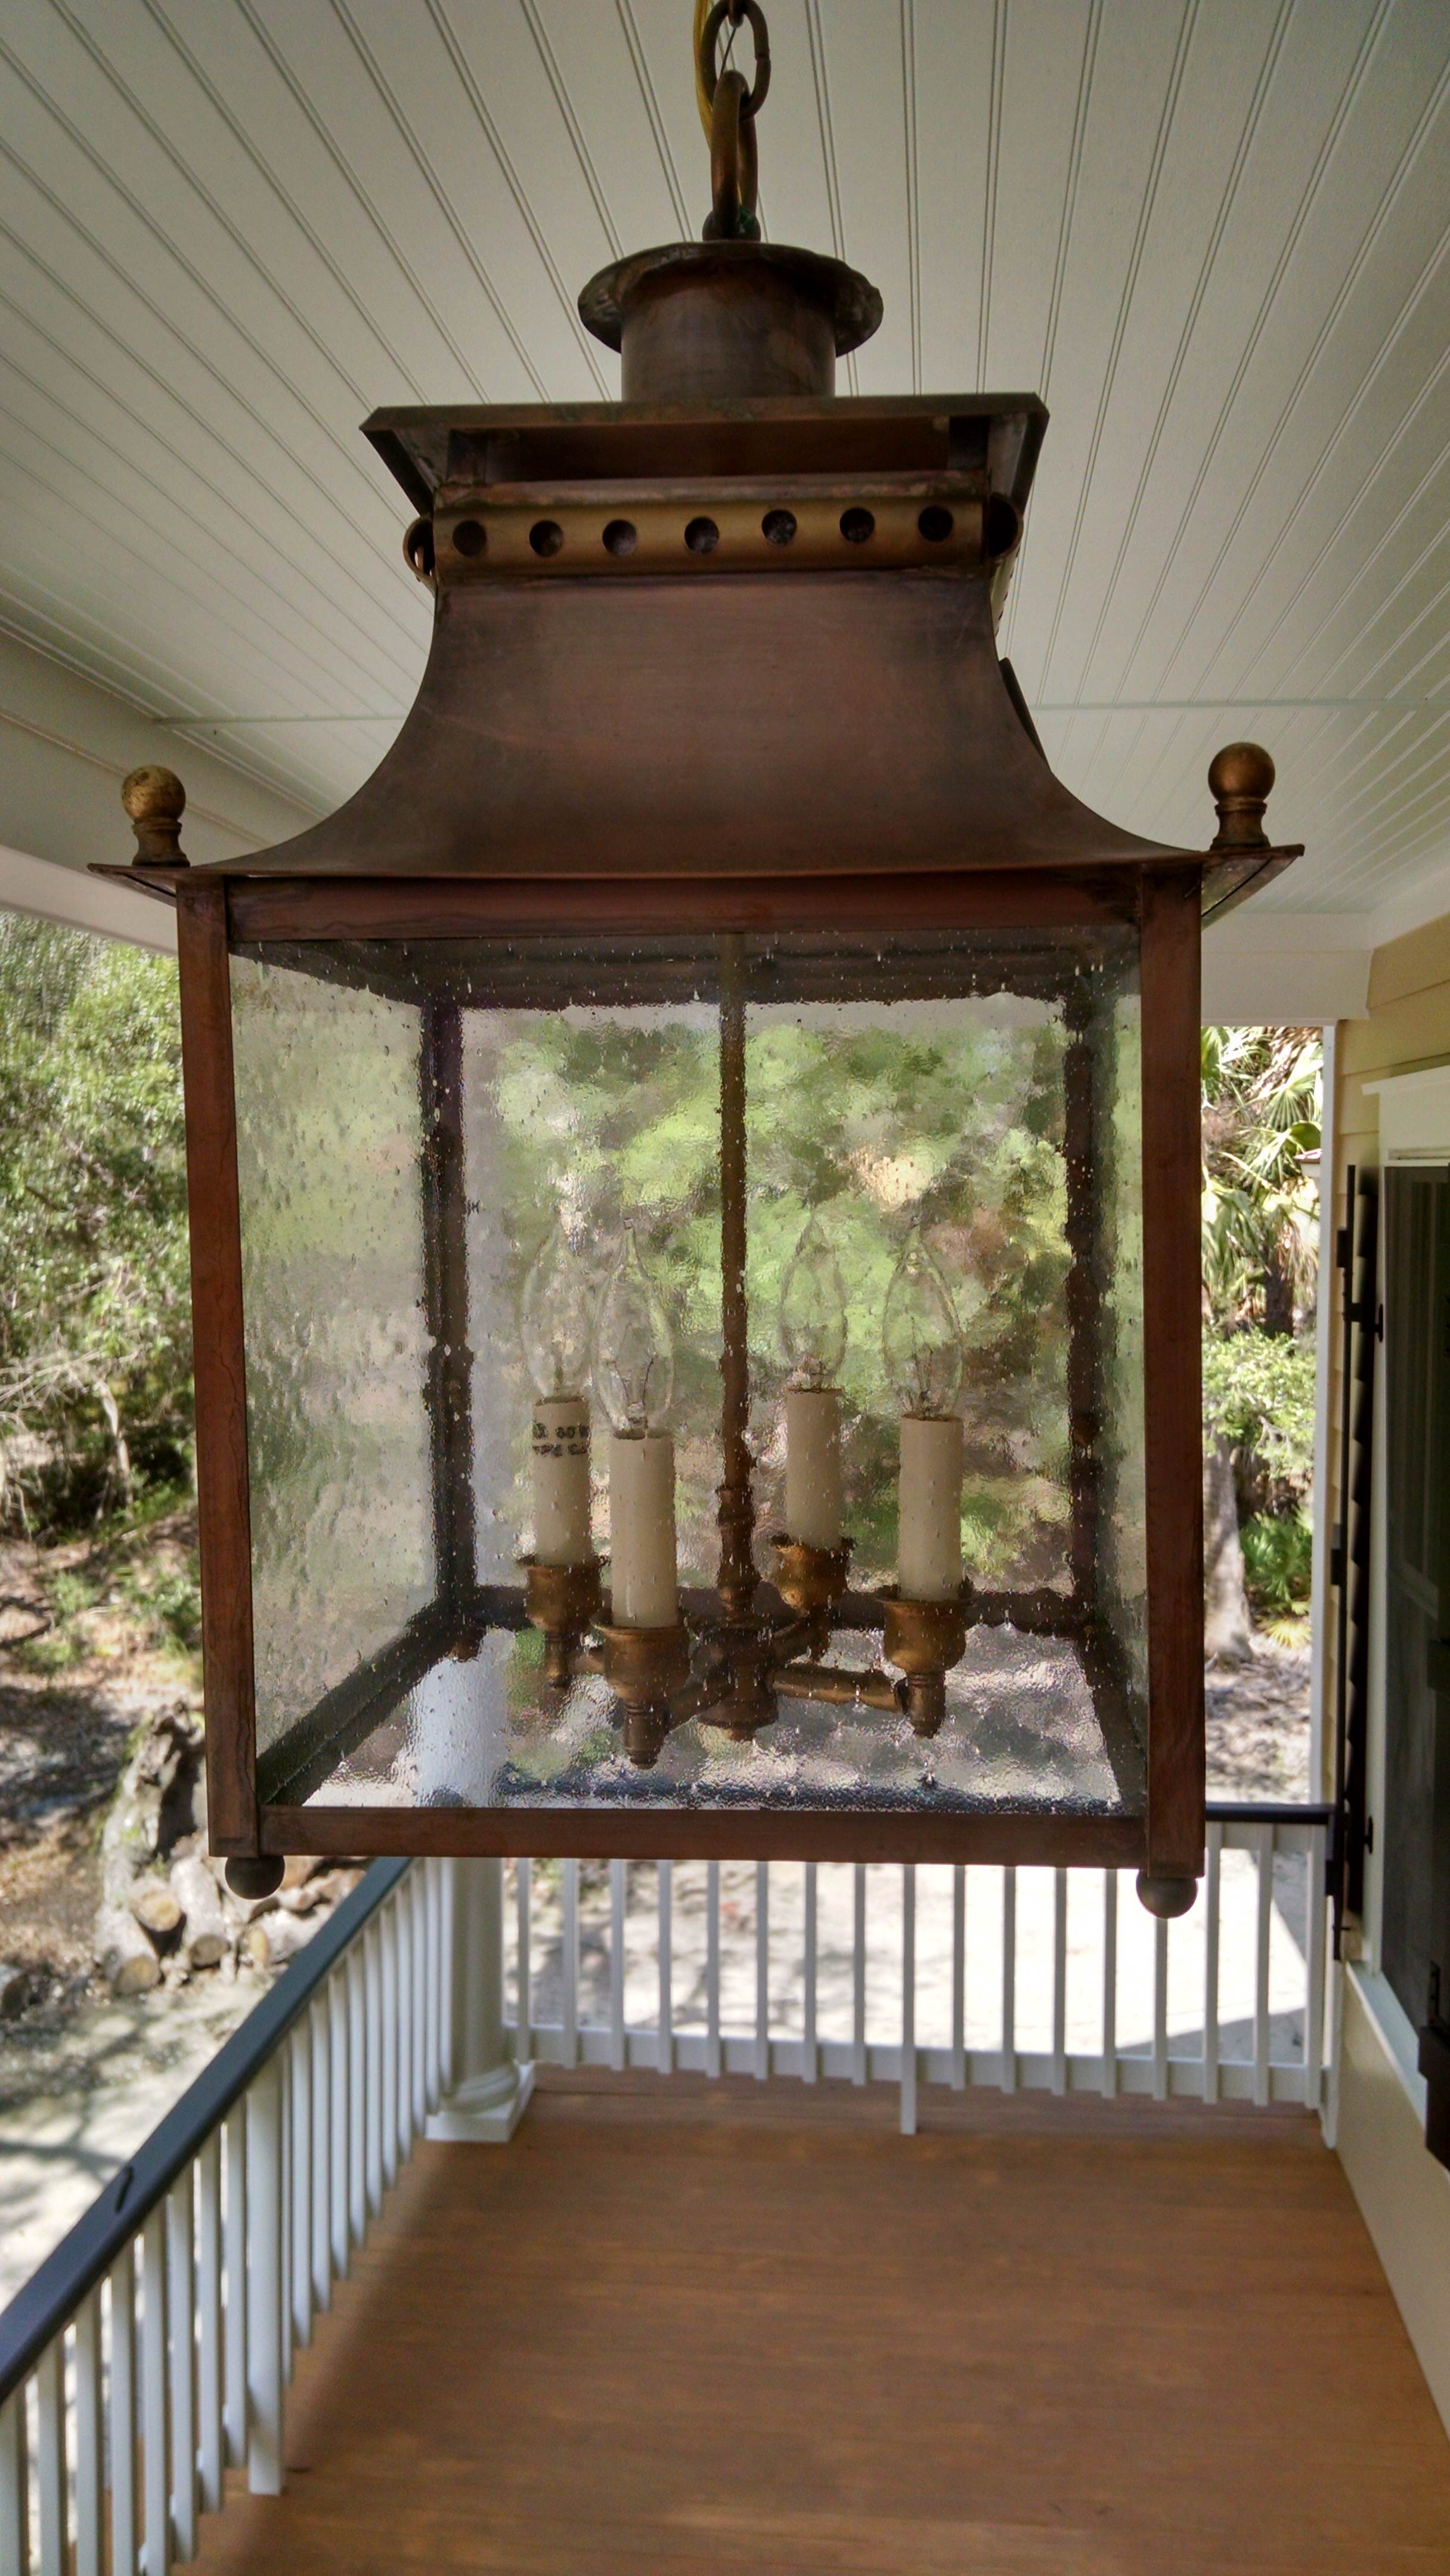 Battery Park Hanging Lantern - Model No. H3585CL | Copper Lantern ...